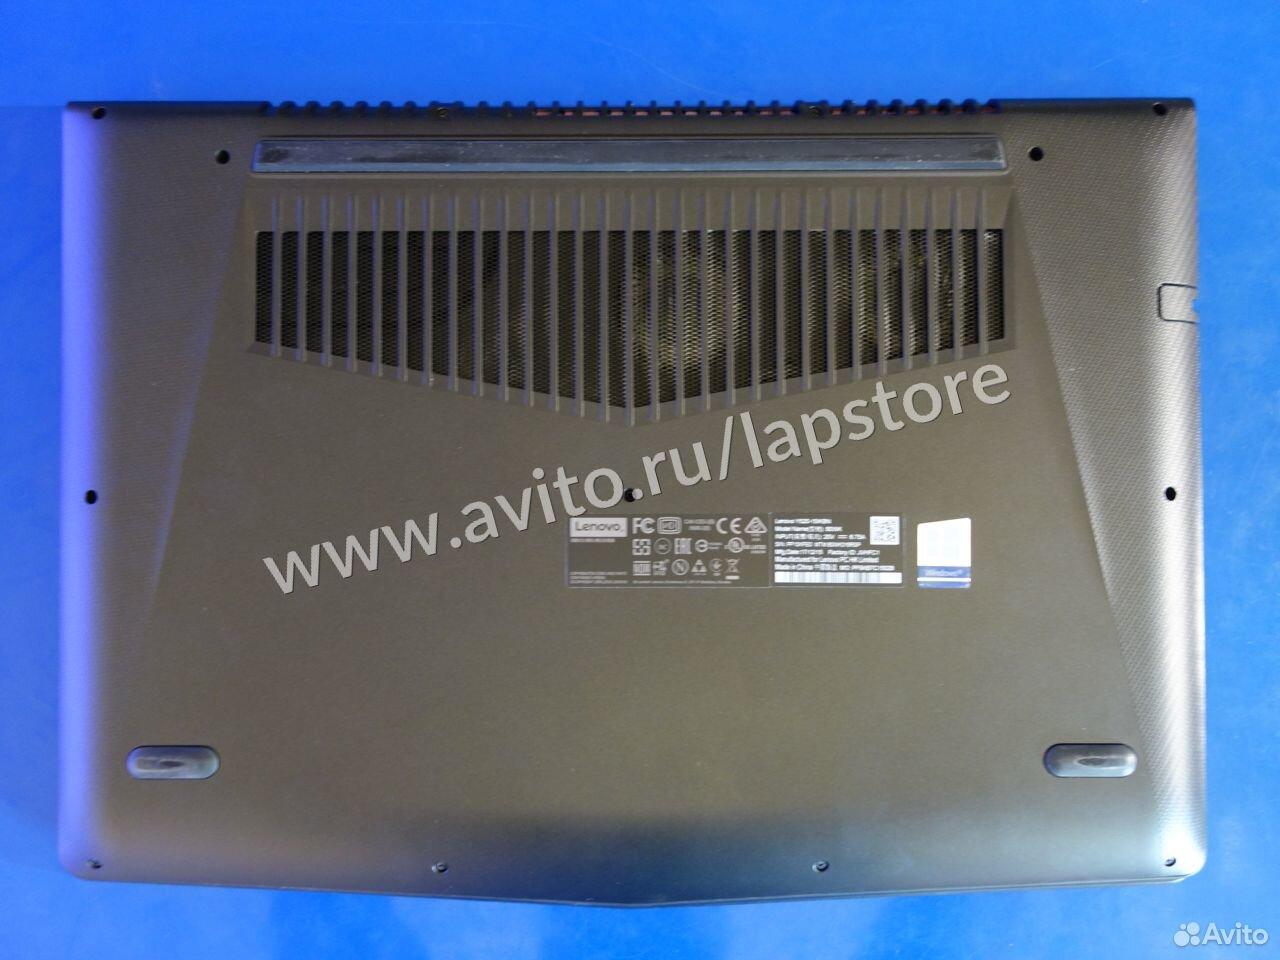 Ноутбук Lenovo Y520 i7-7700HQ/16GB/256+1T/GTX1050  84012422018 купить 9